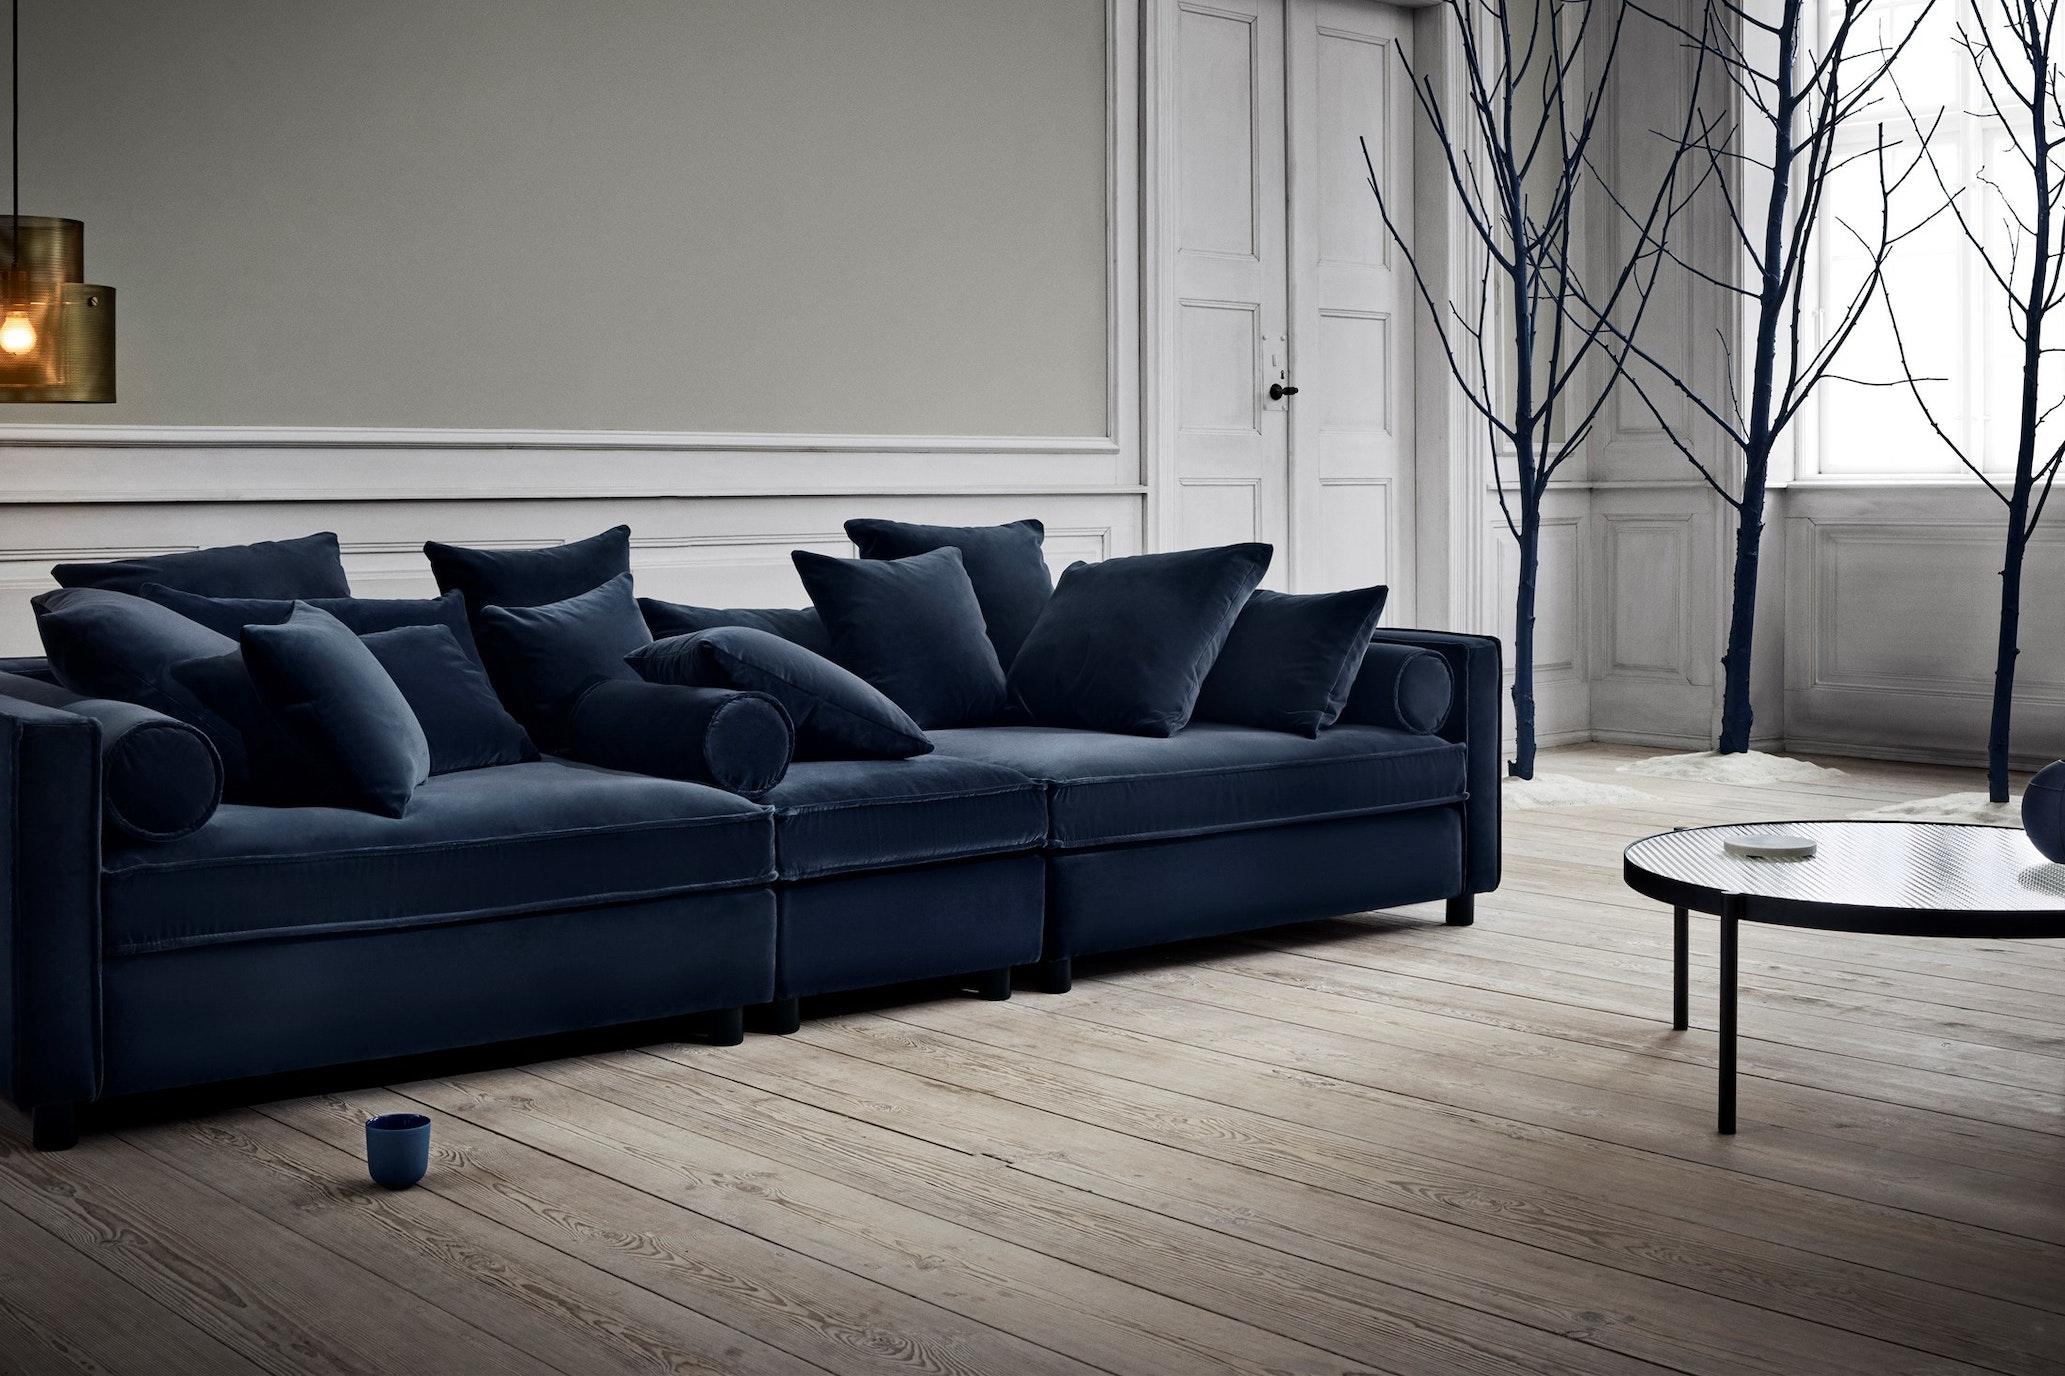 sofa big, mr. big sofa by bolia | haute living, Design ideen